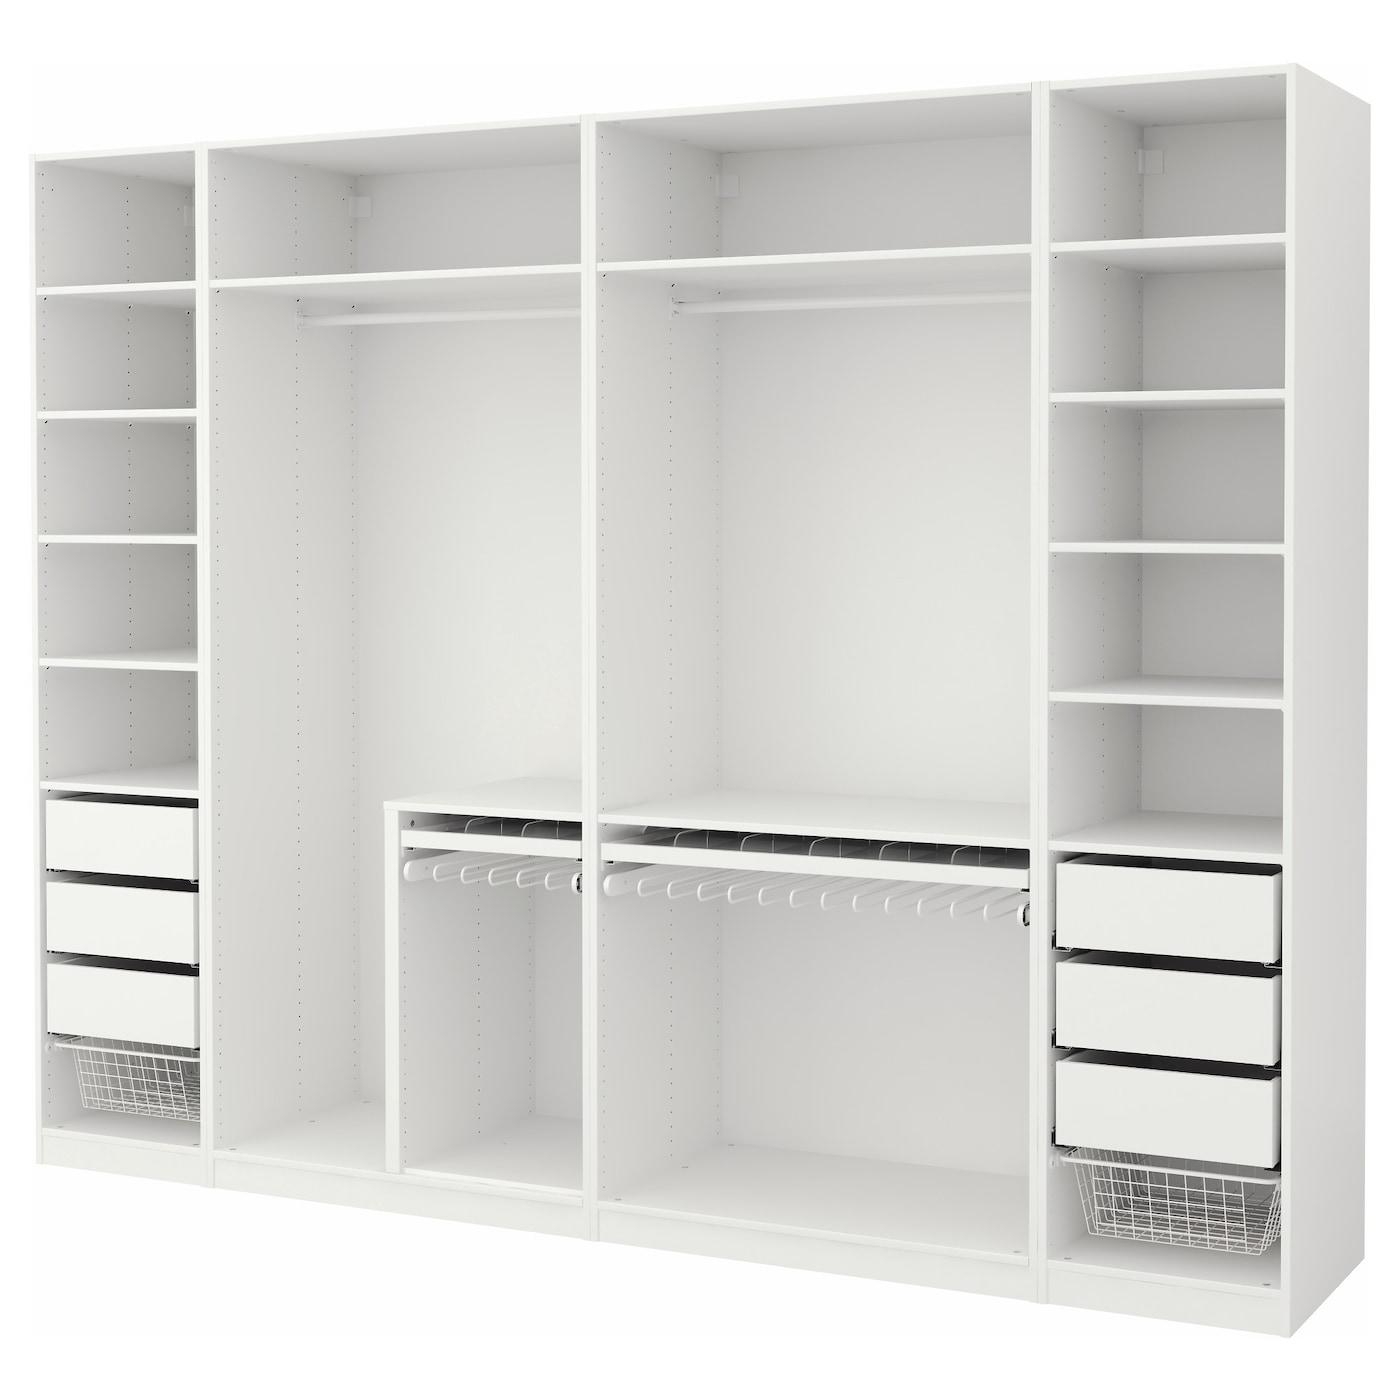 pax wardrobe white 300 x 58 x 236 cm ikea